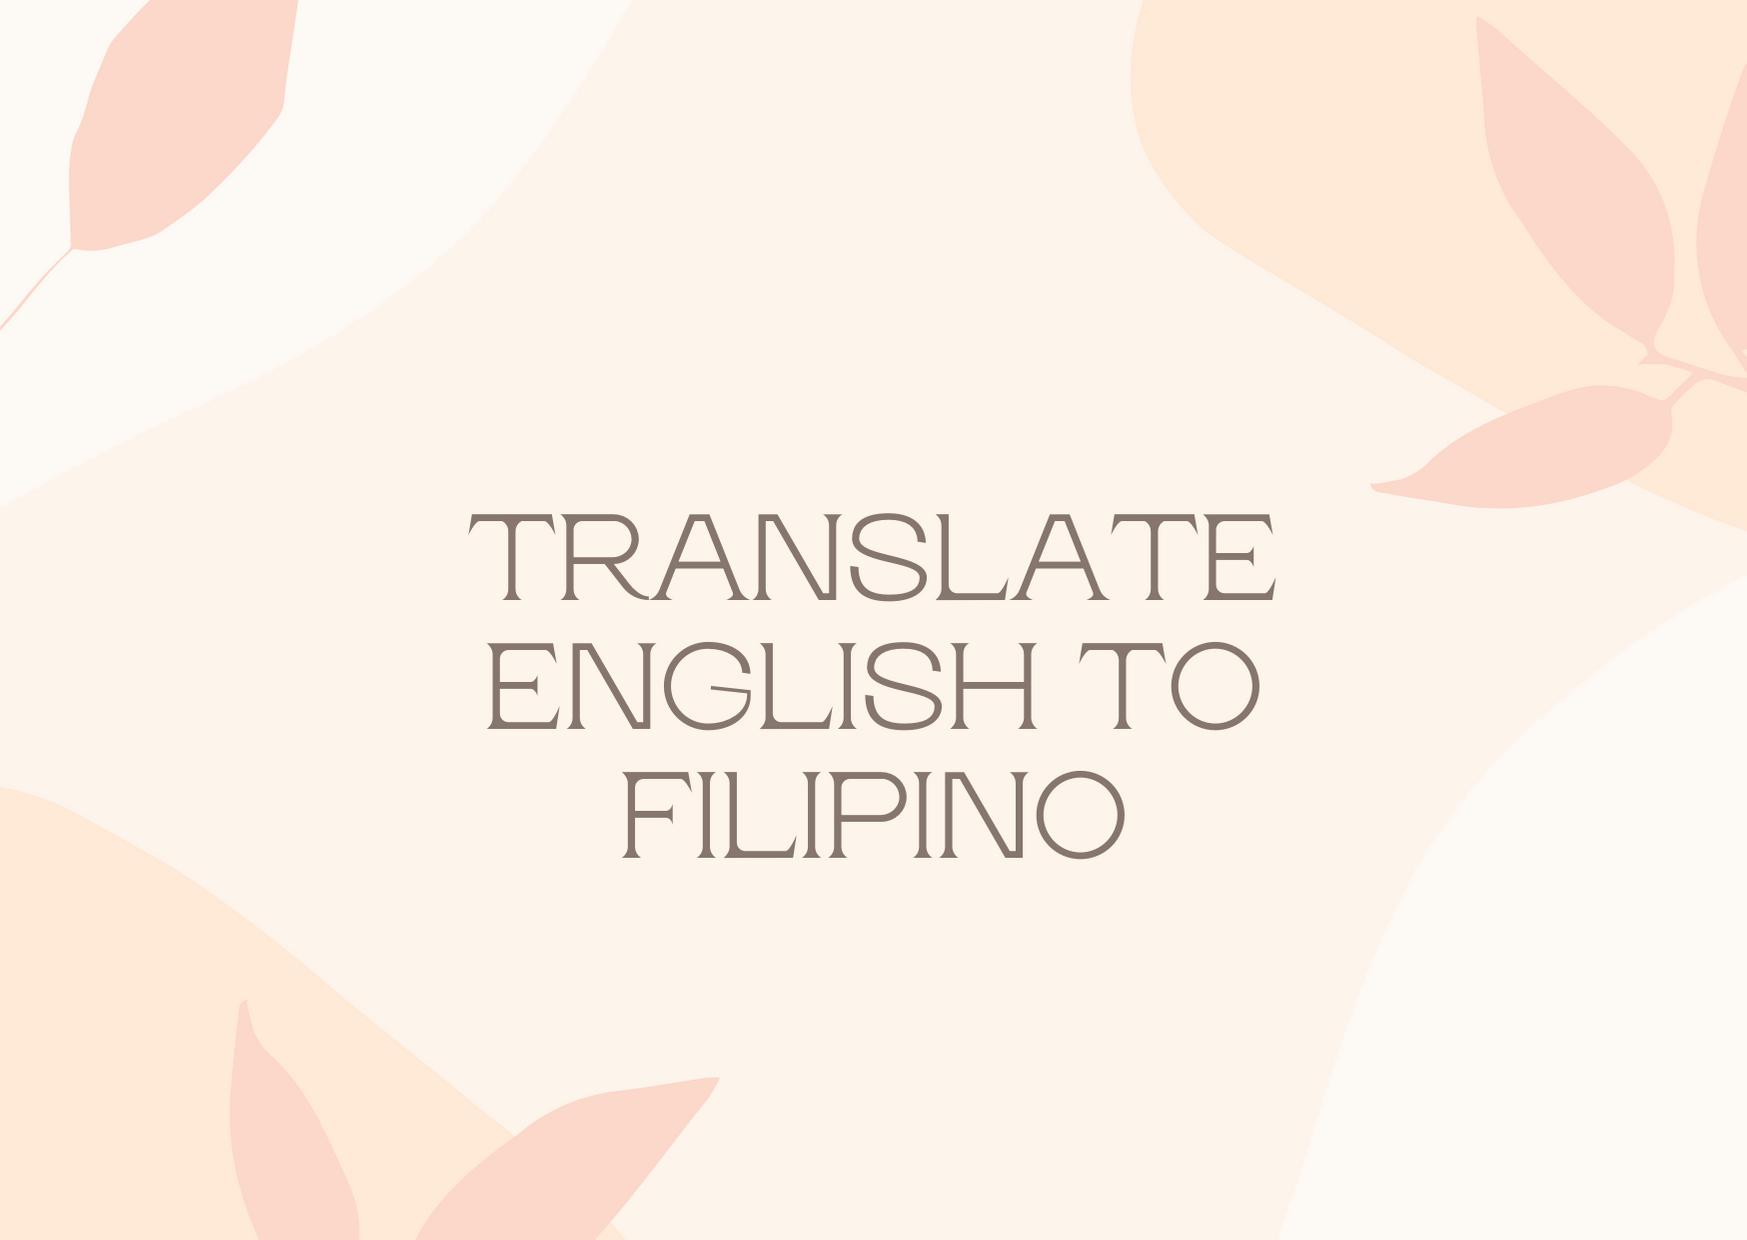 translate 250 English words to Tagalog Filipino or vice versa